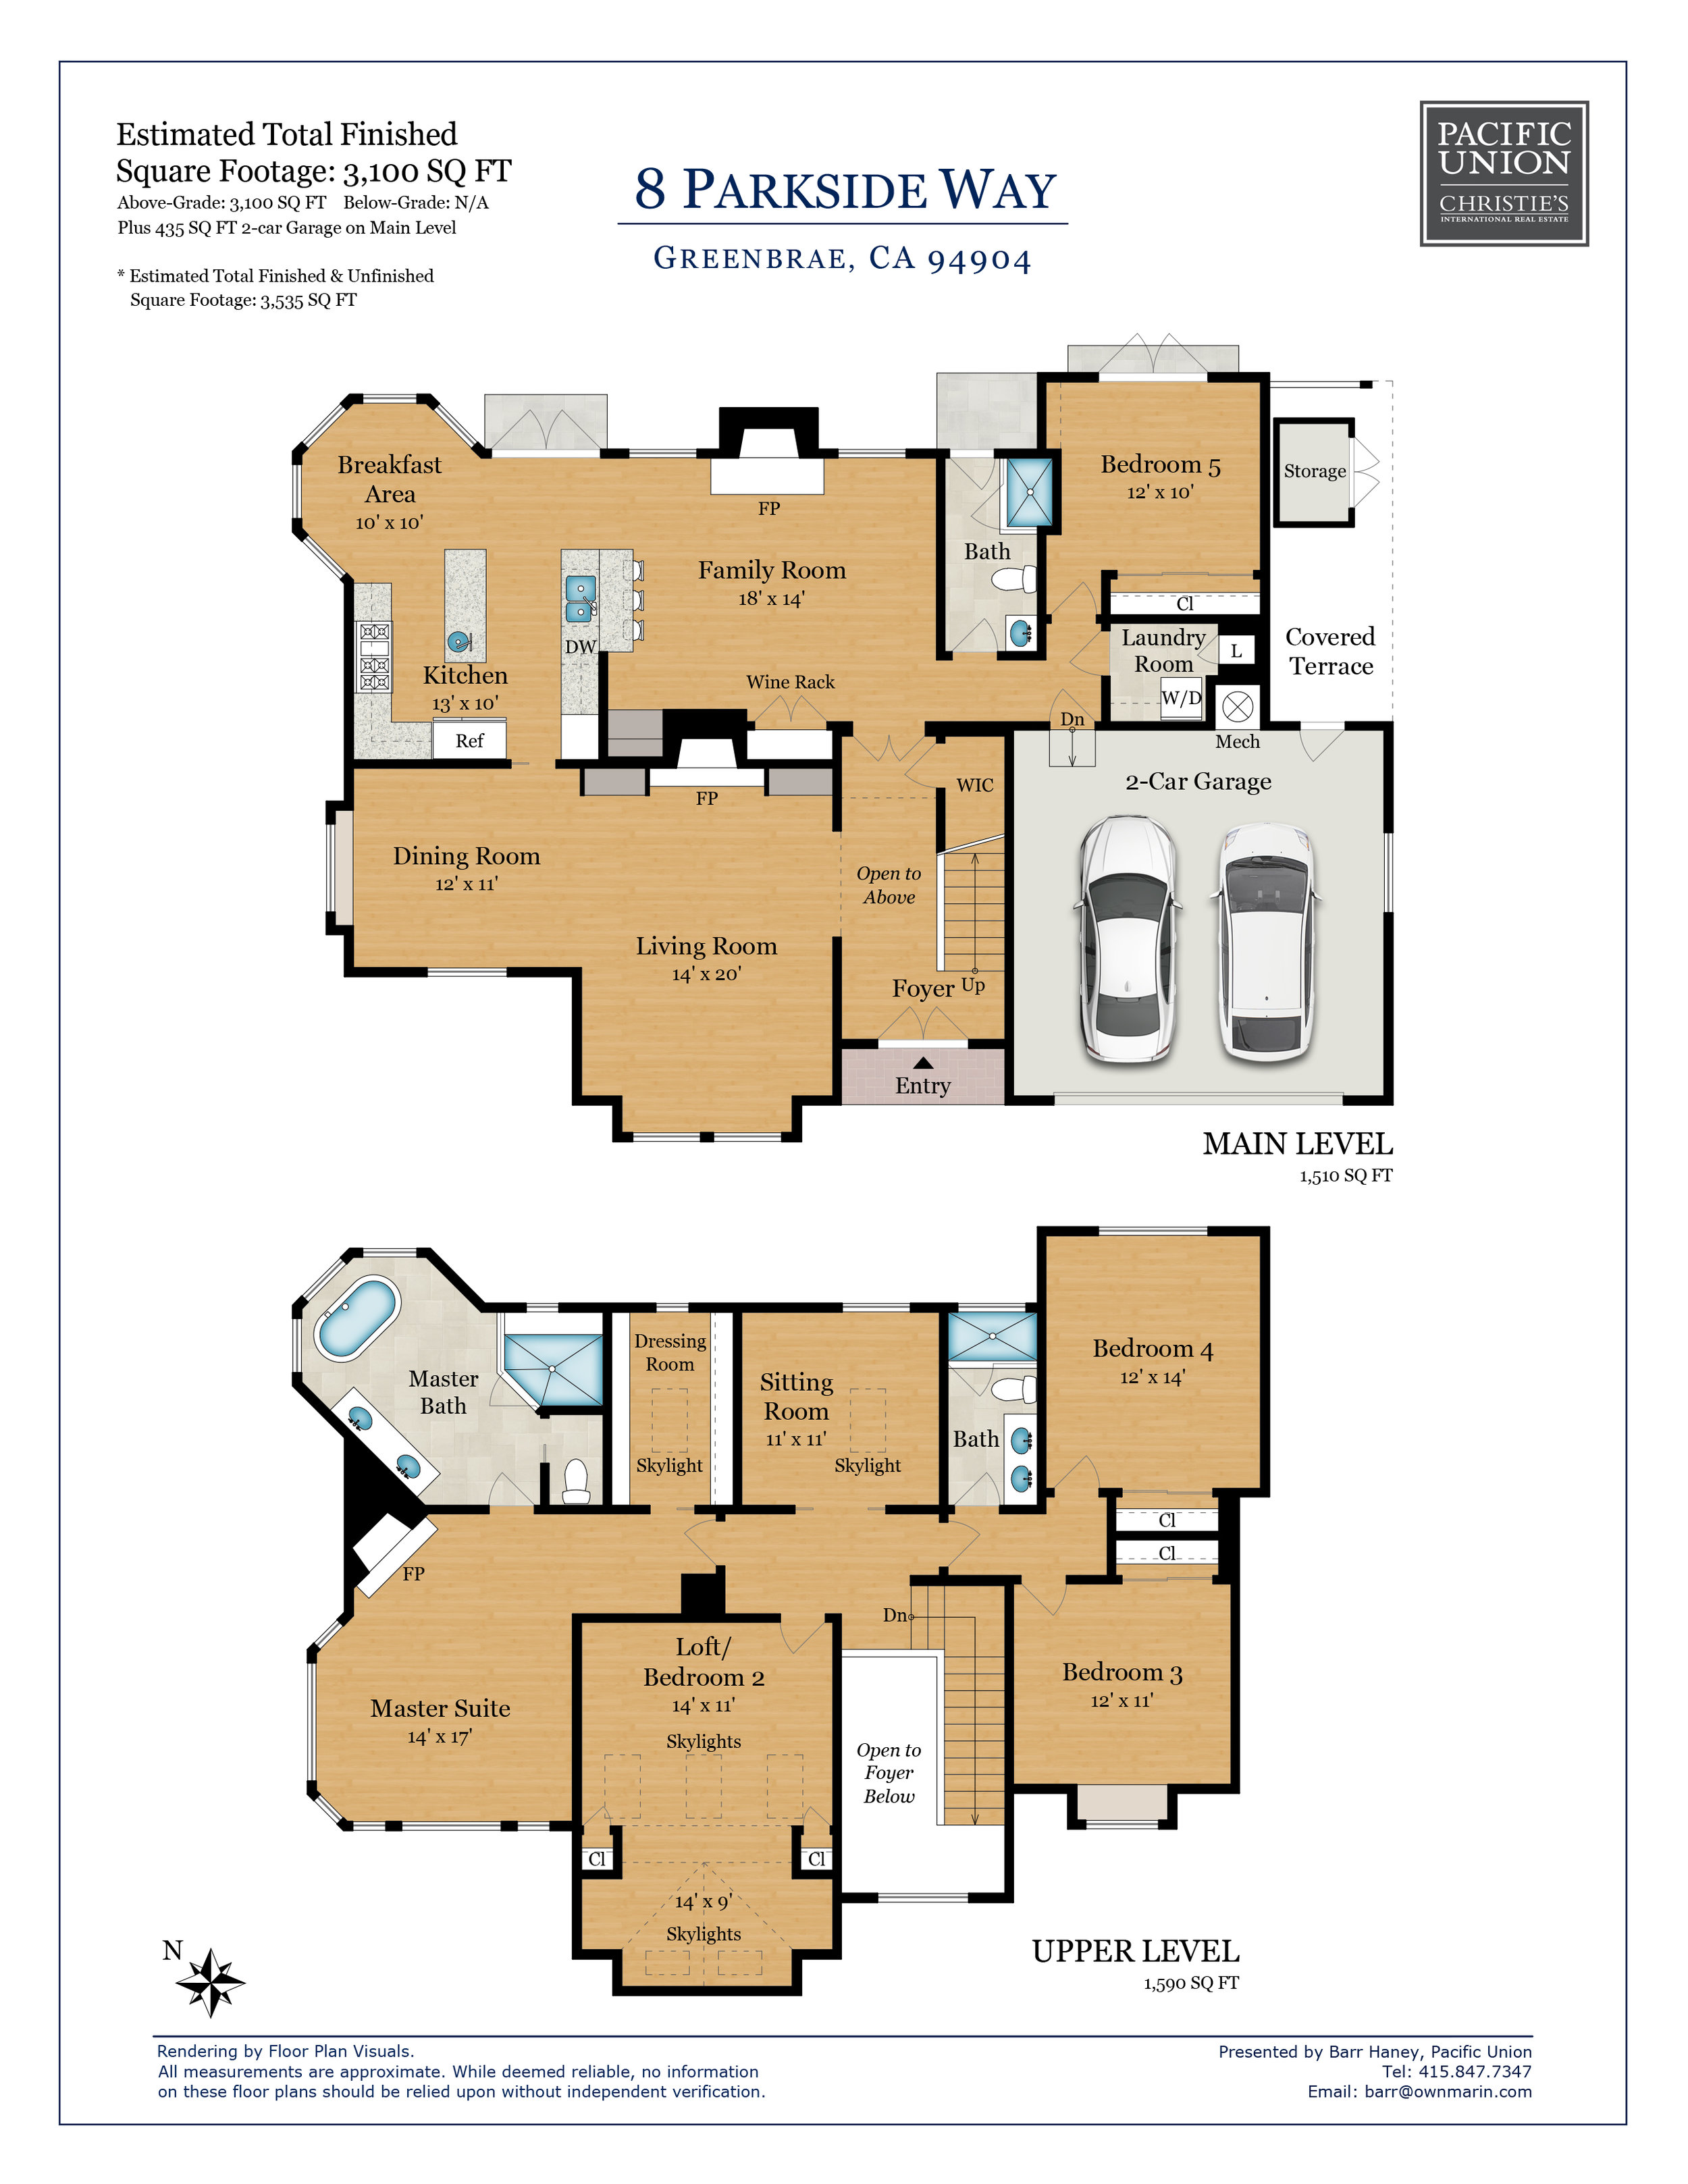 BH-8ParksideWay-FloorPlan-Print-R1.jpg